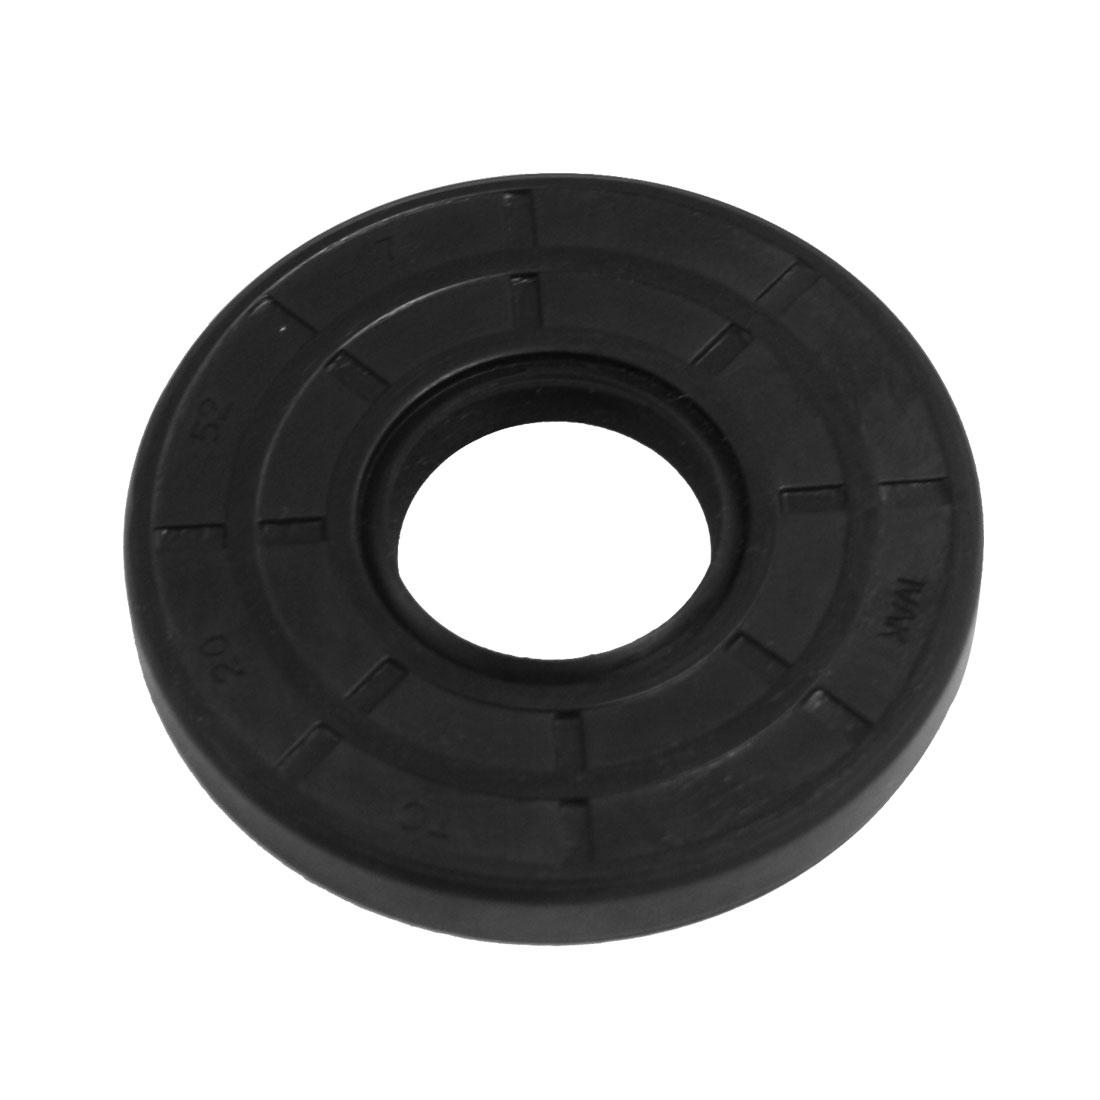 Steel Spring TC BNR Double Lip Oil Seal 20mm x 52mm x 7mm